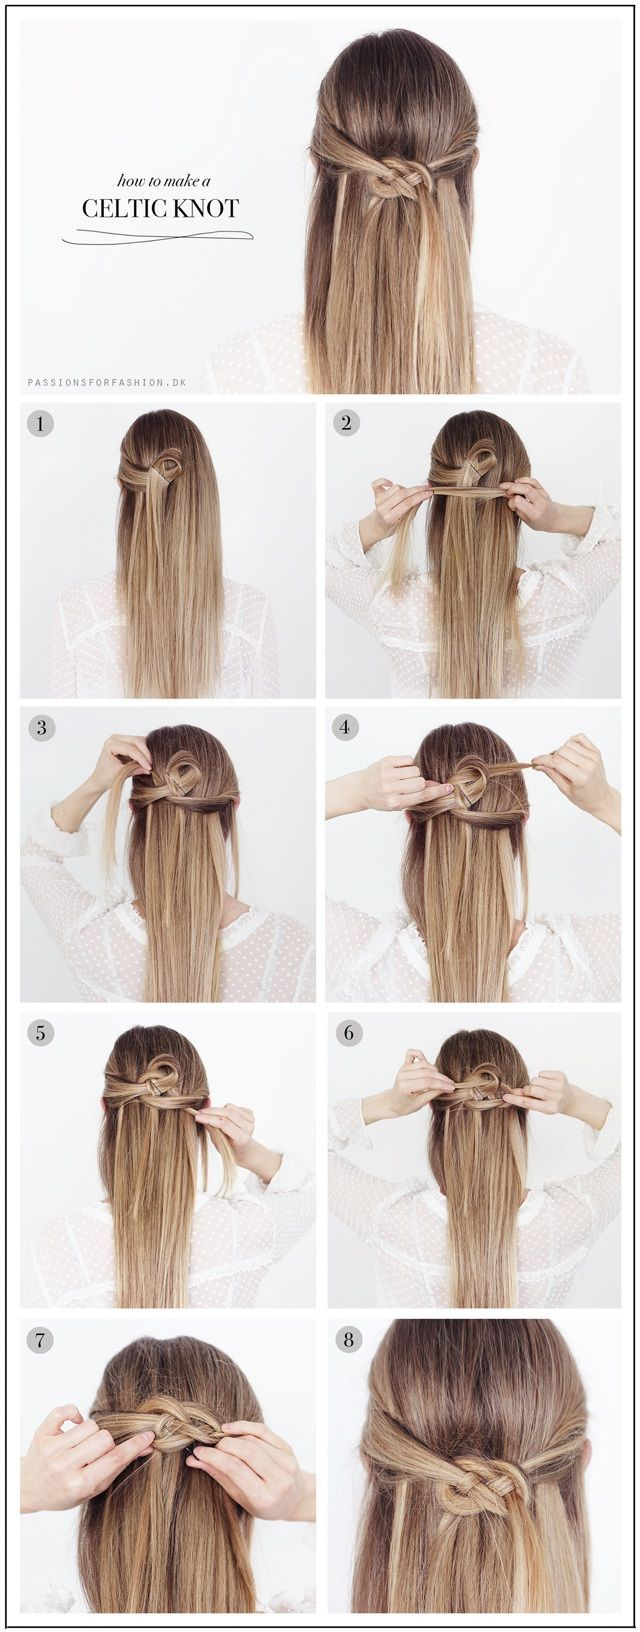 kinderkapsels beste fotografie - Page 2 of 14 | Hair style, Girl ...